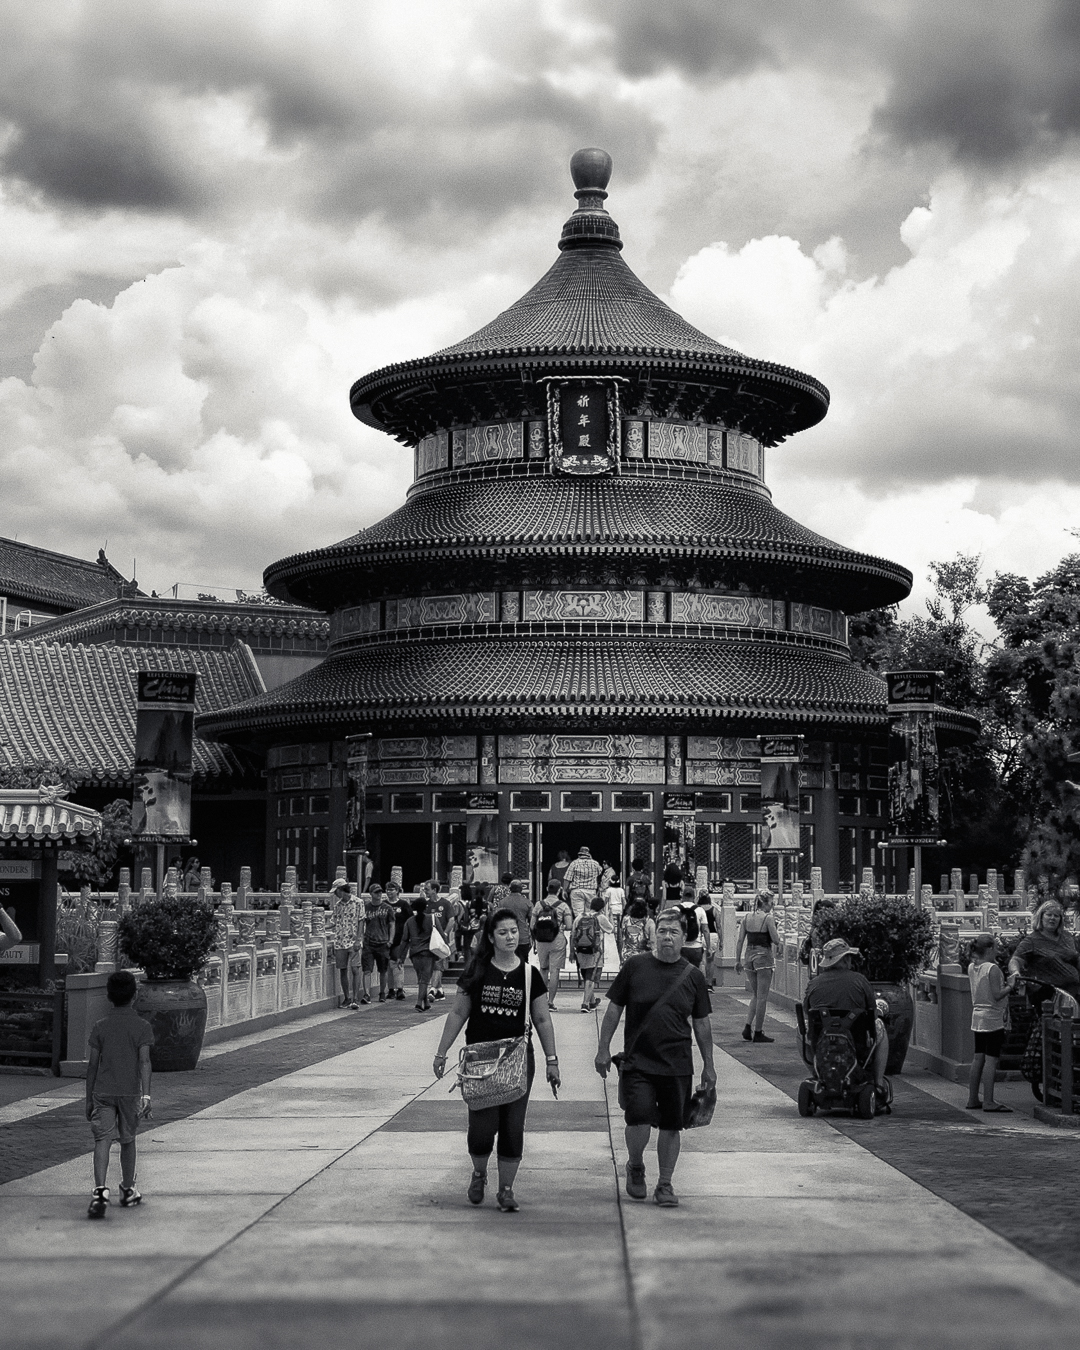 Animal Kingdom - Disney-0001-Brian Suman Photography.jpg